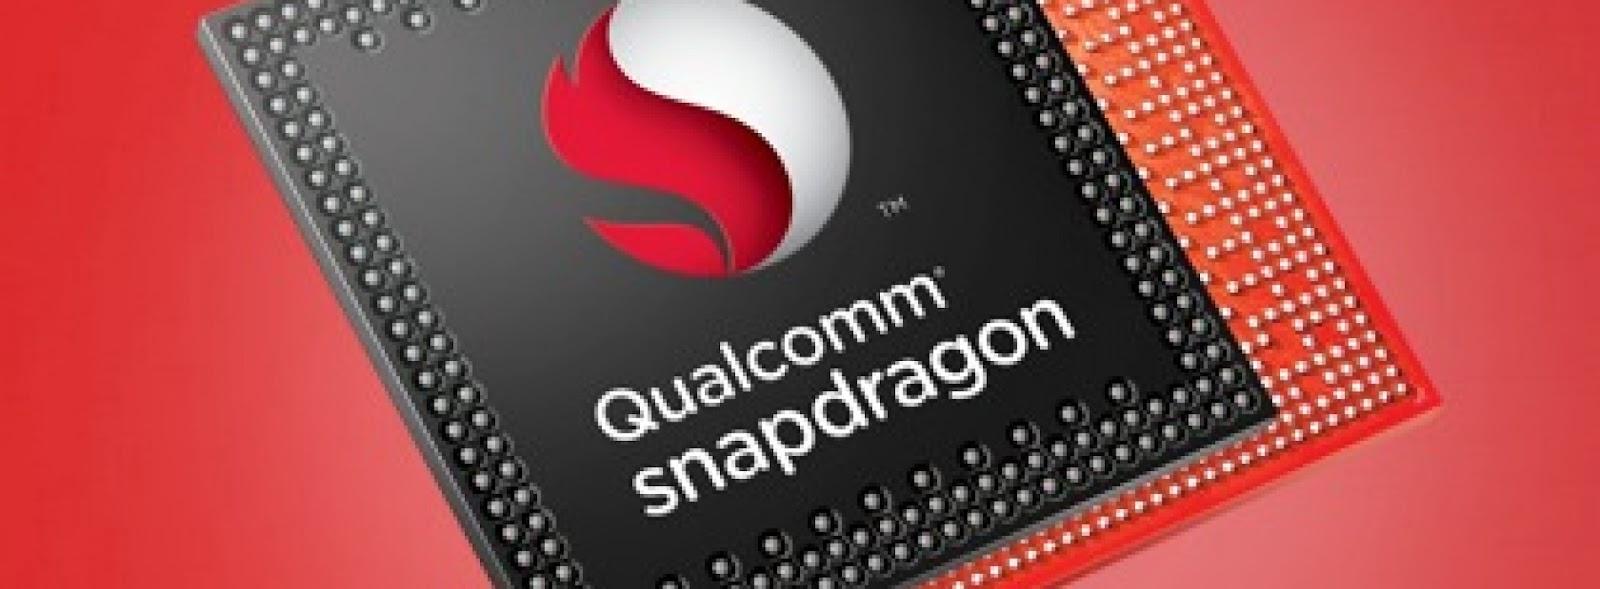 Wallpaper HD 2016: 30+ WALLPAPER HD QUALCOMM SNAPDRAGON Qualcomm Snapdragon Wallpaper